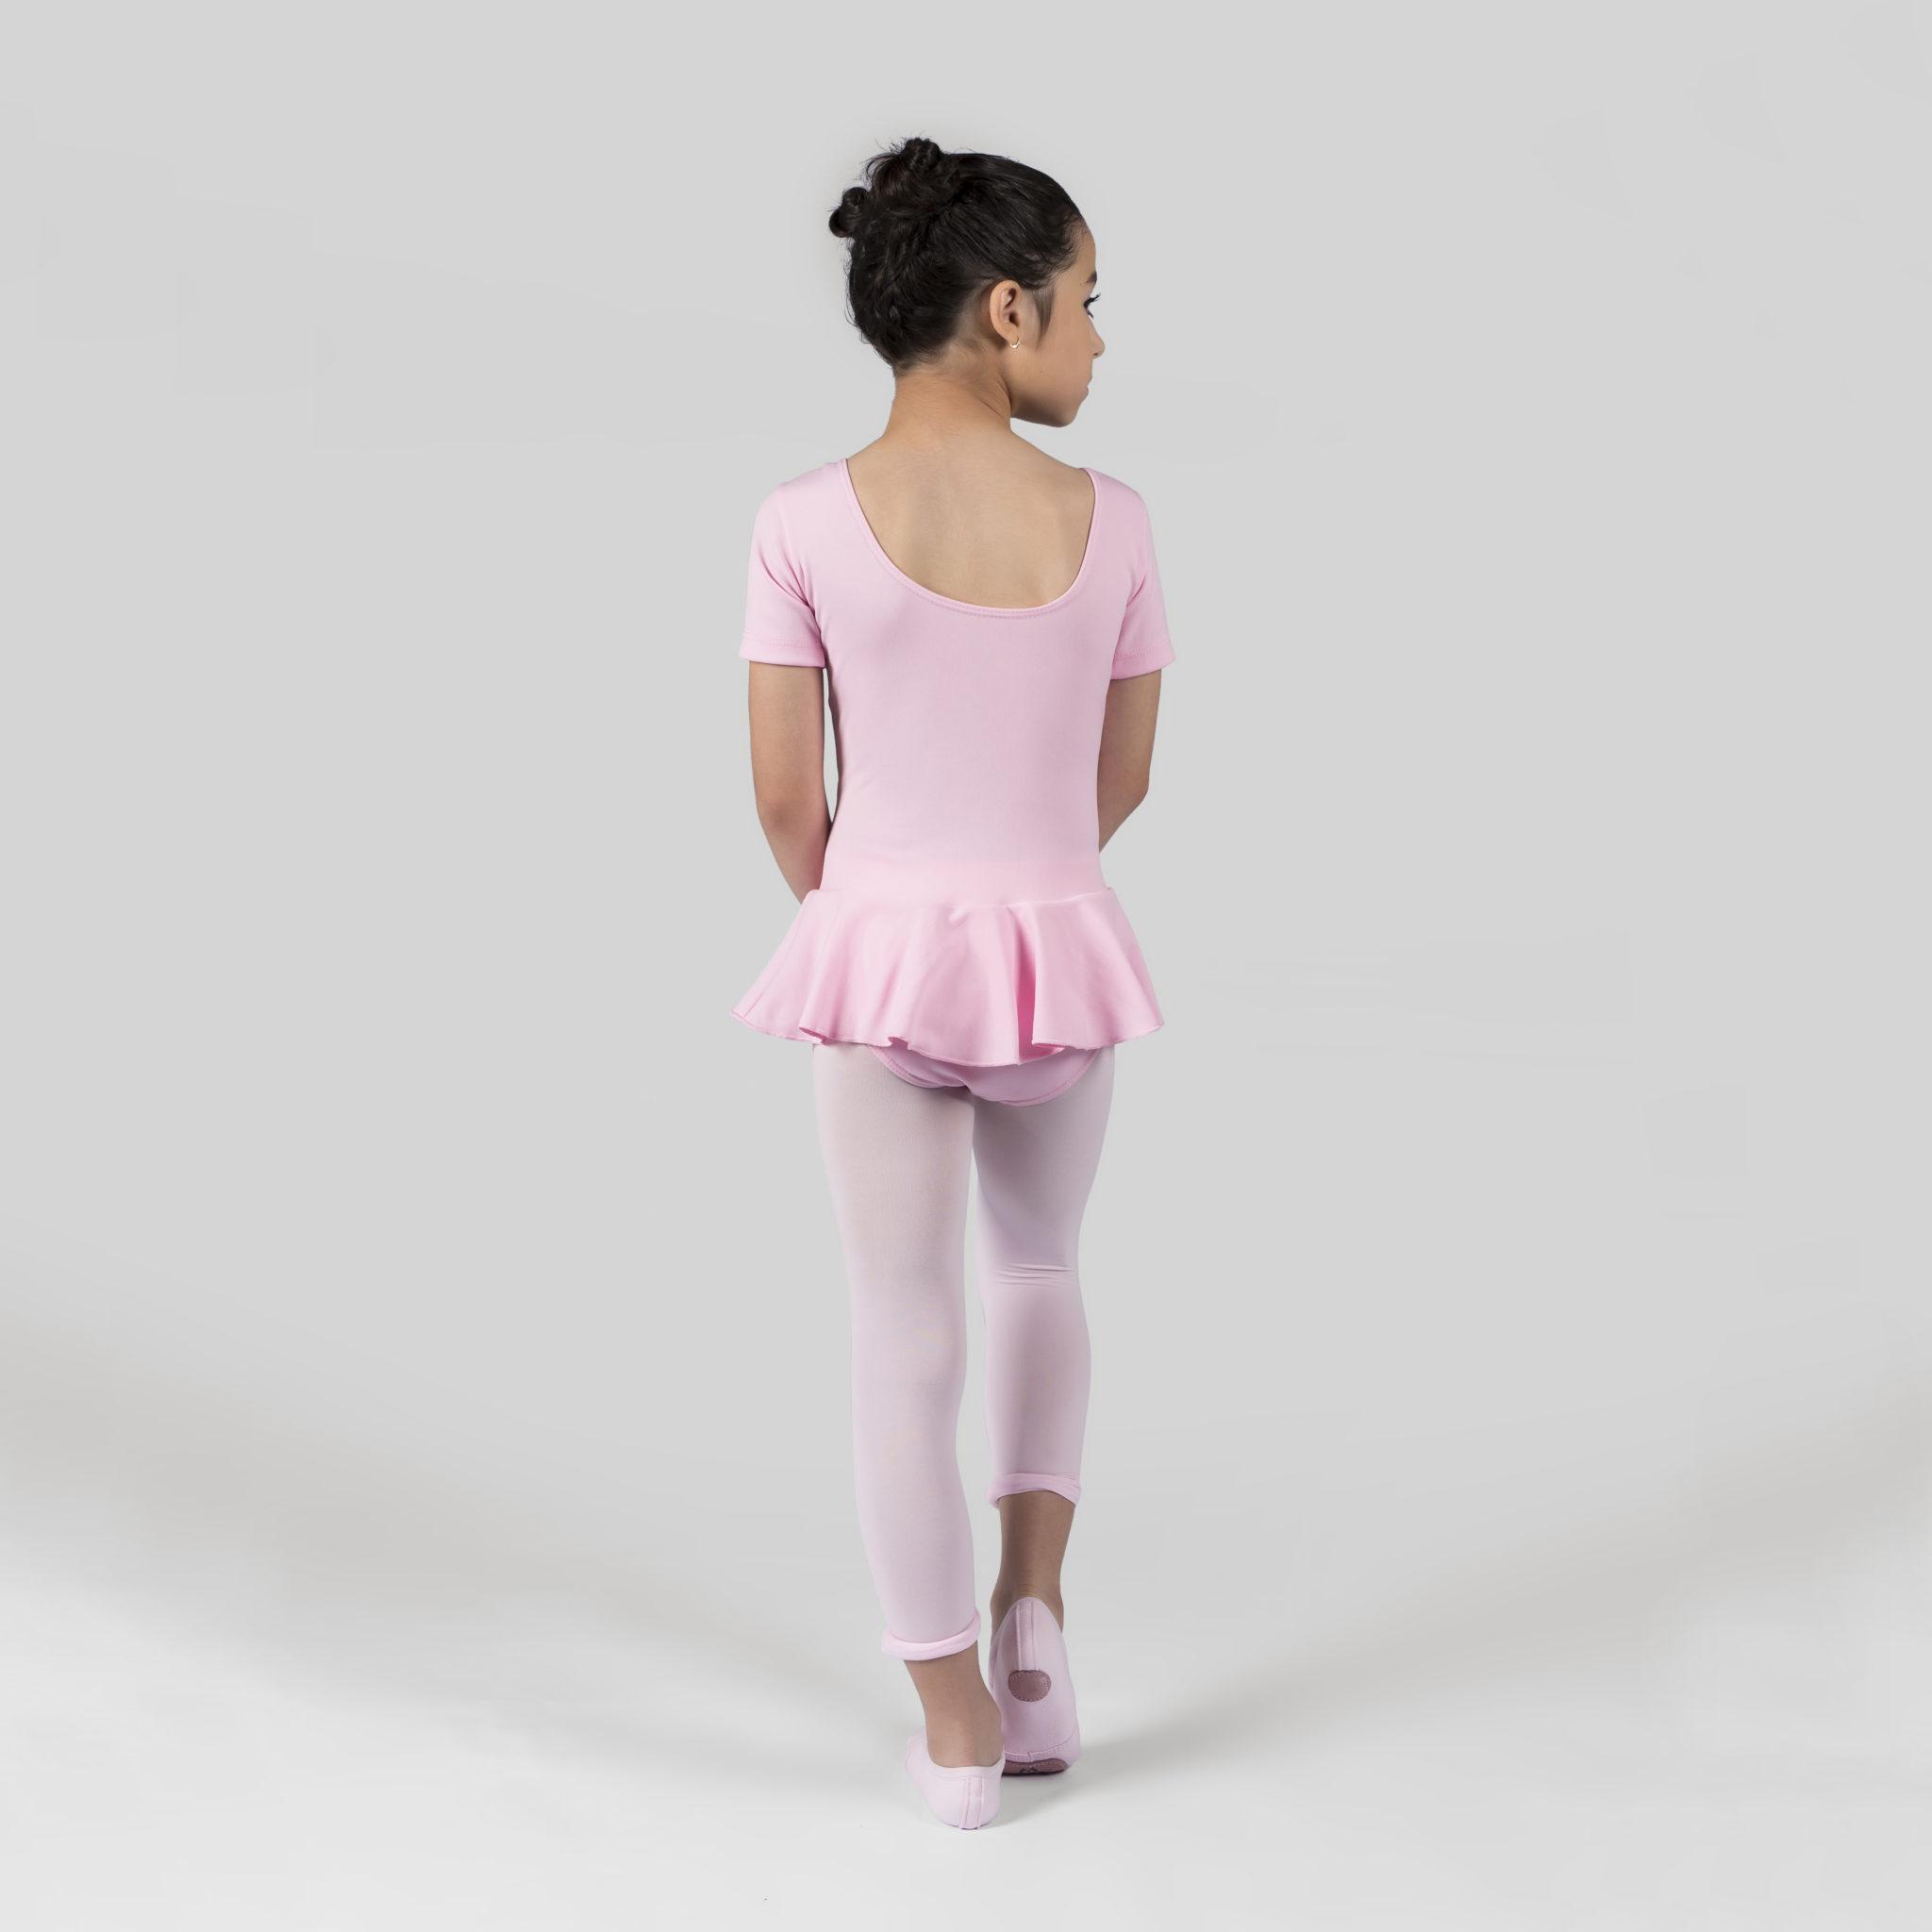 c2e114092e Collant Com Saia de Helanca Decote Redondo 120 - Evidence Ballet ...